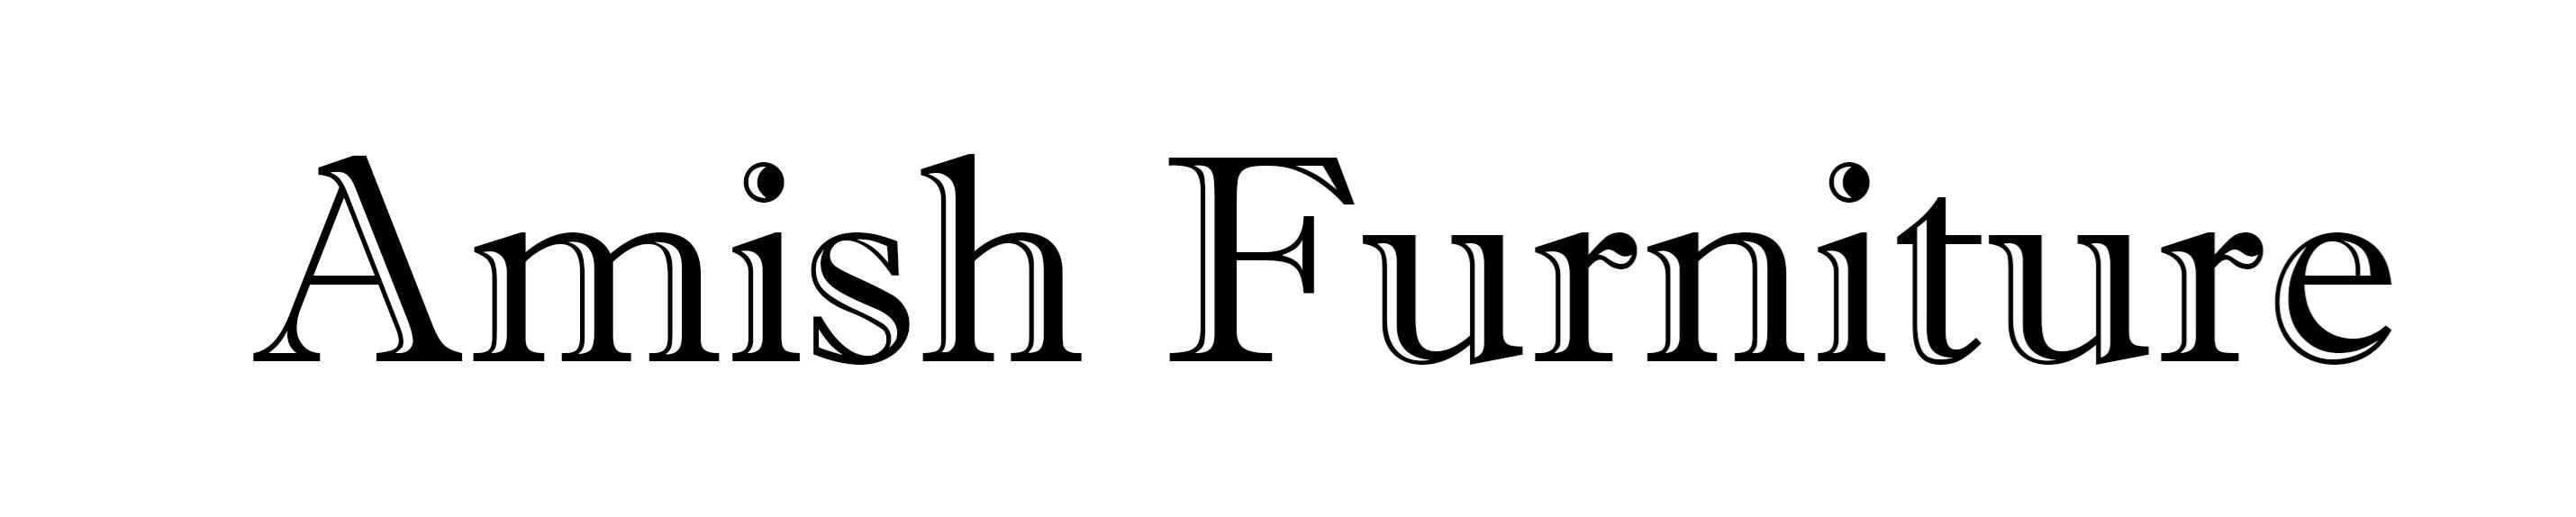 New york monroe county henrietta - Amish Furniture Manufacturer Page